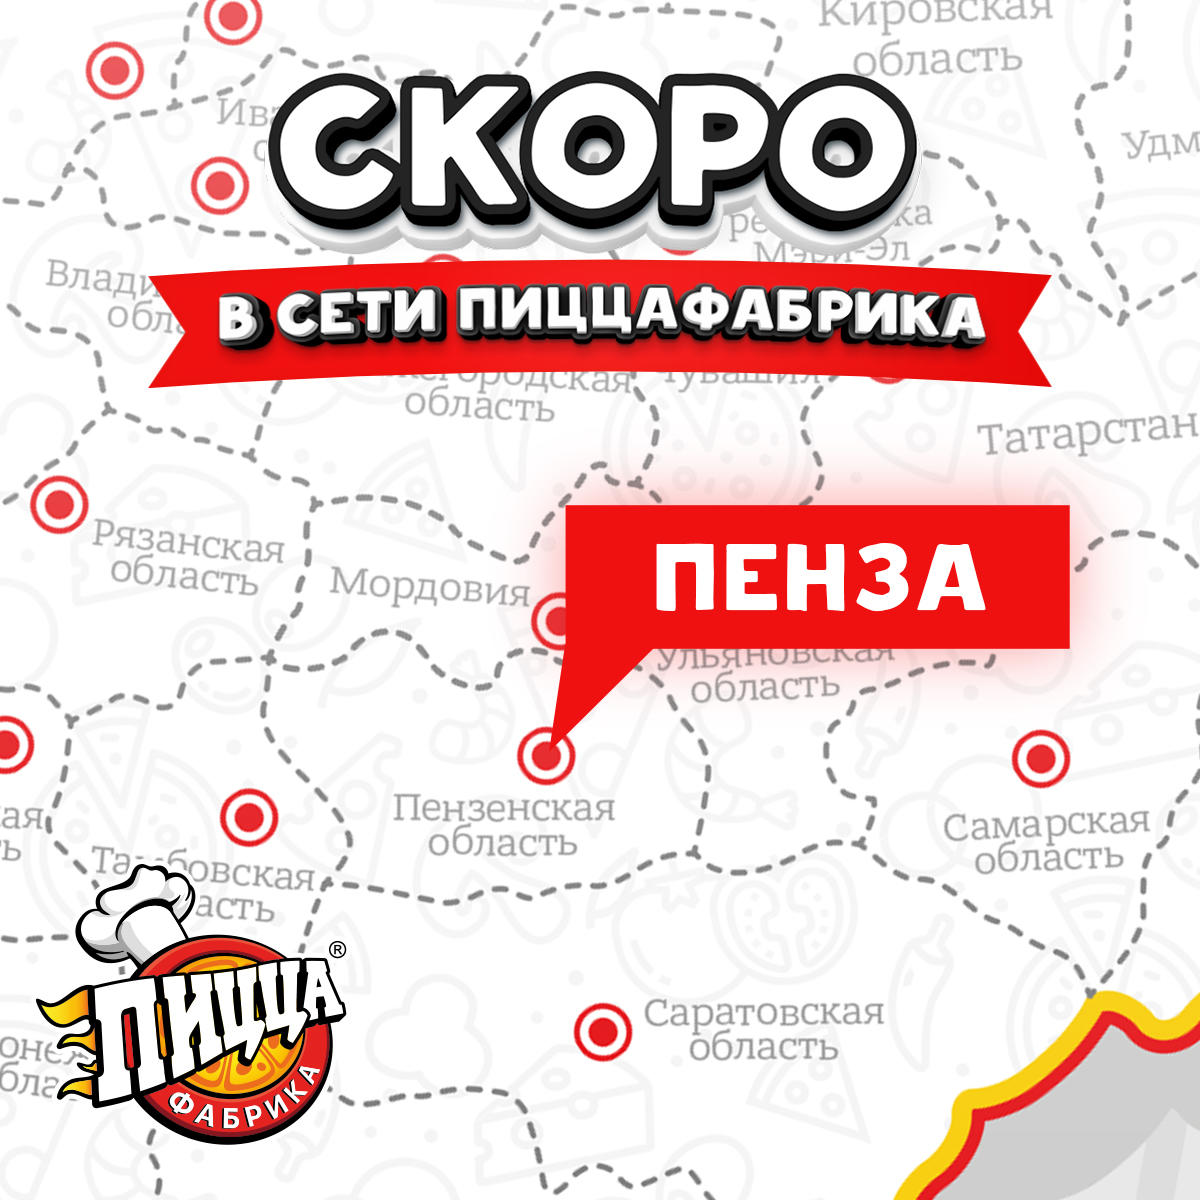 Пенза - новый город на карте ПиццаФабрики